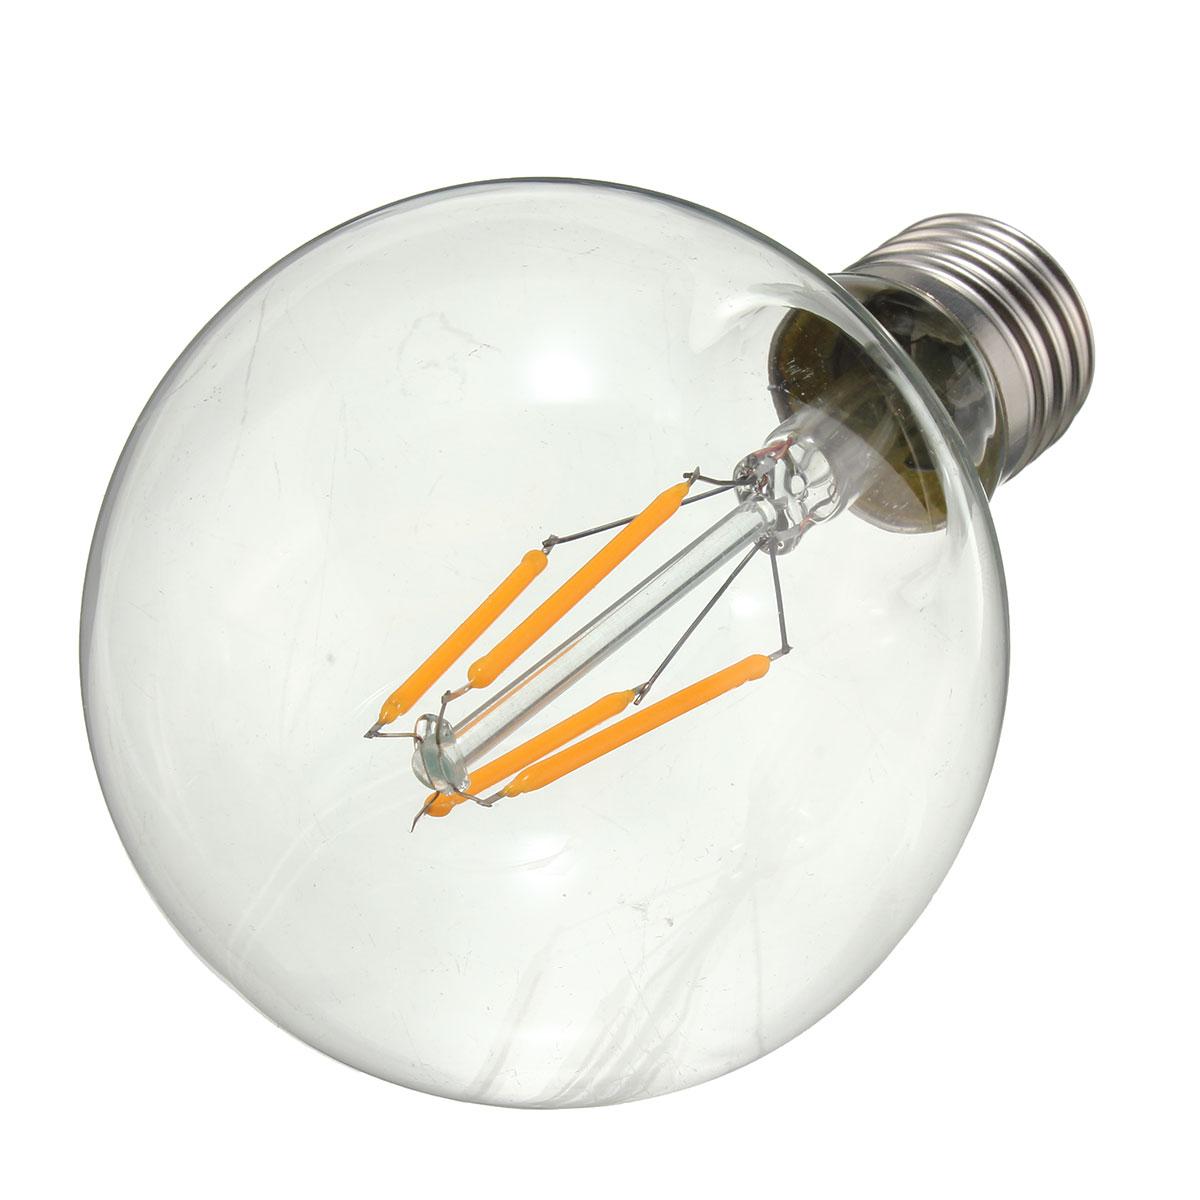 Dimmable G80 E27 4W COB Warm White 400Lumens Incandescent Edison Retro Light Lamp Bulb AC110V AC220V